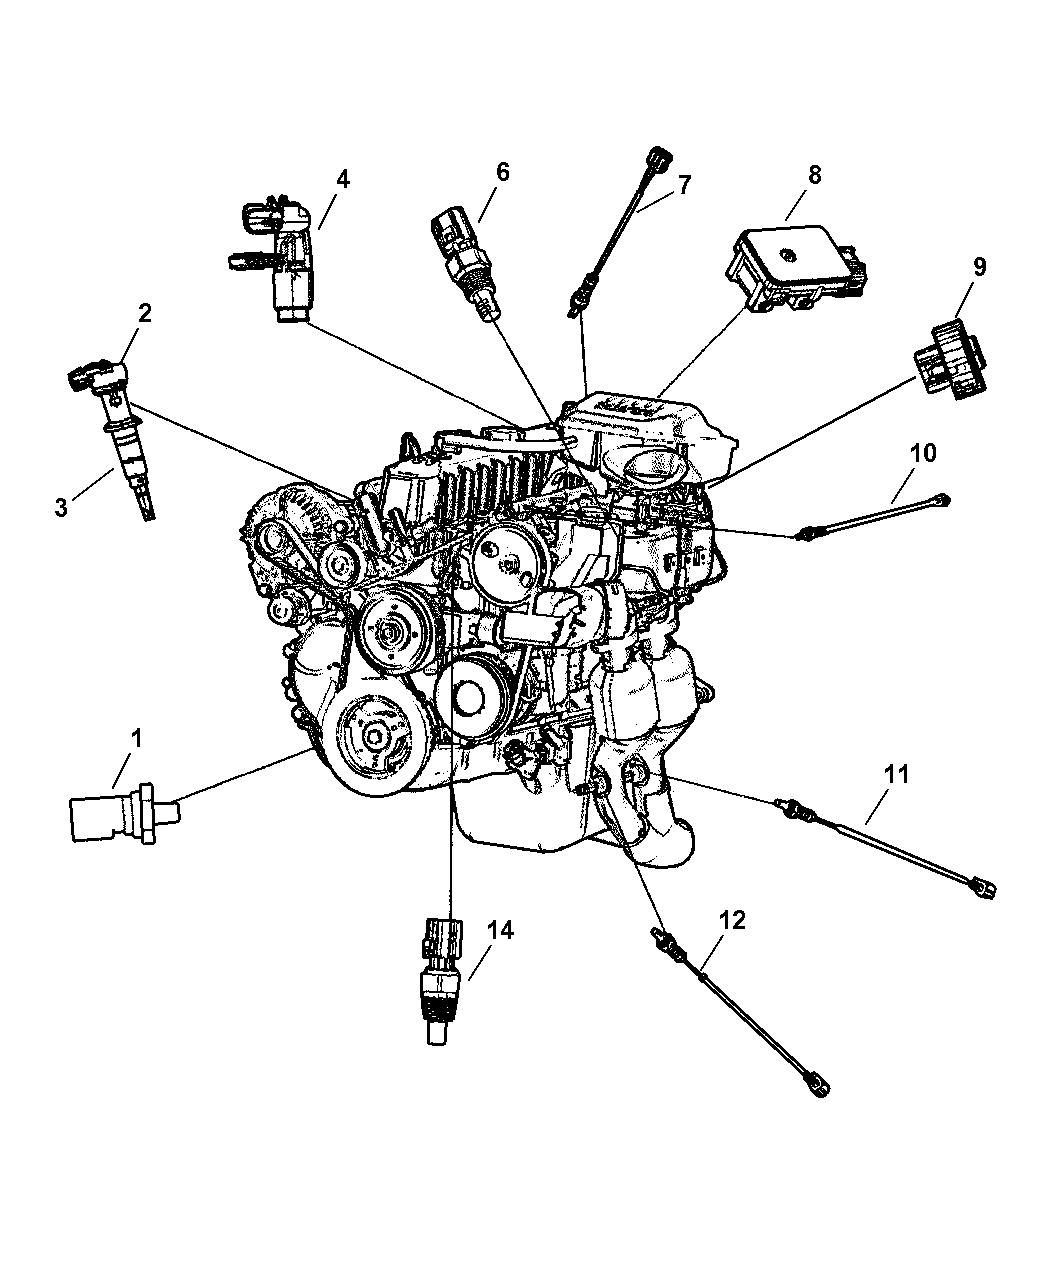 97 jeep cherokee throttle position sensor diagram 4874371ac genuine mopar sensor throttle position  genuine mopar sensor throttle position